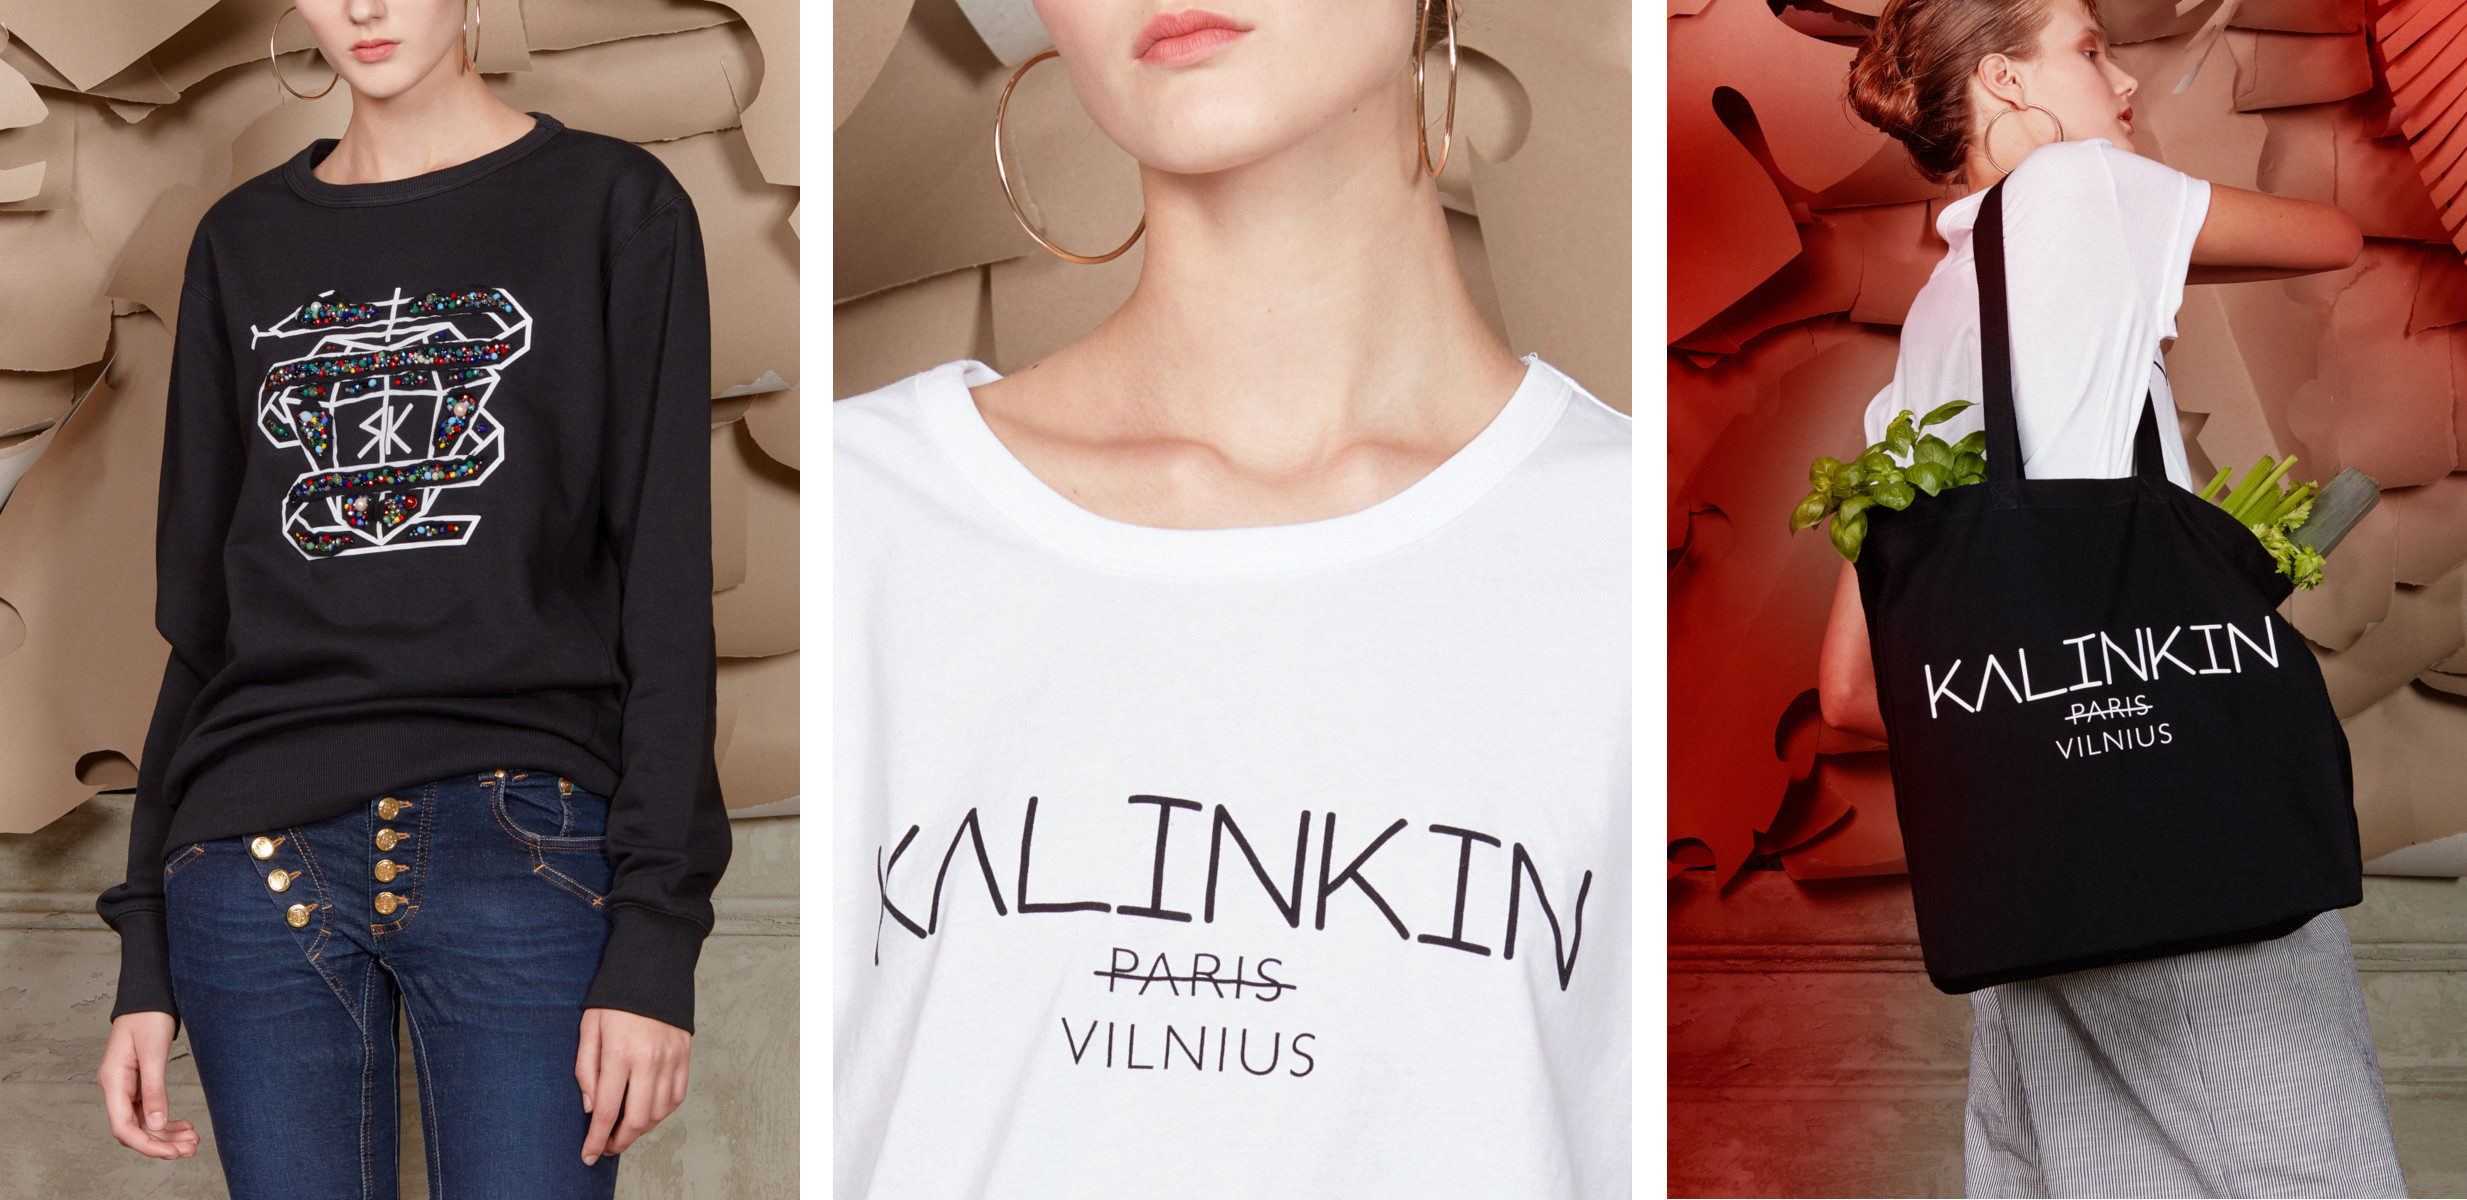 KALINKIN LOVES VILNIUS